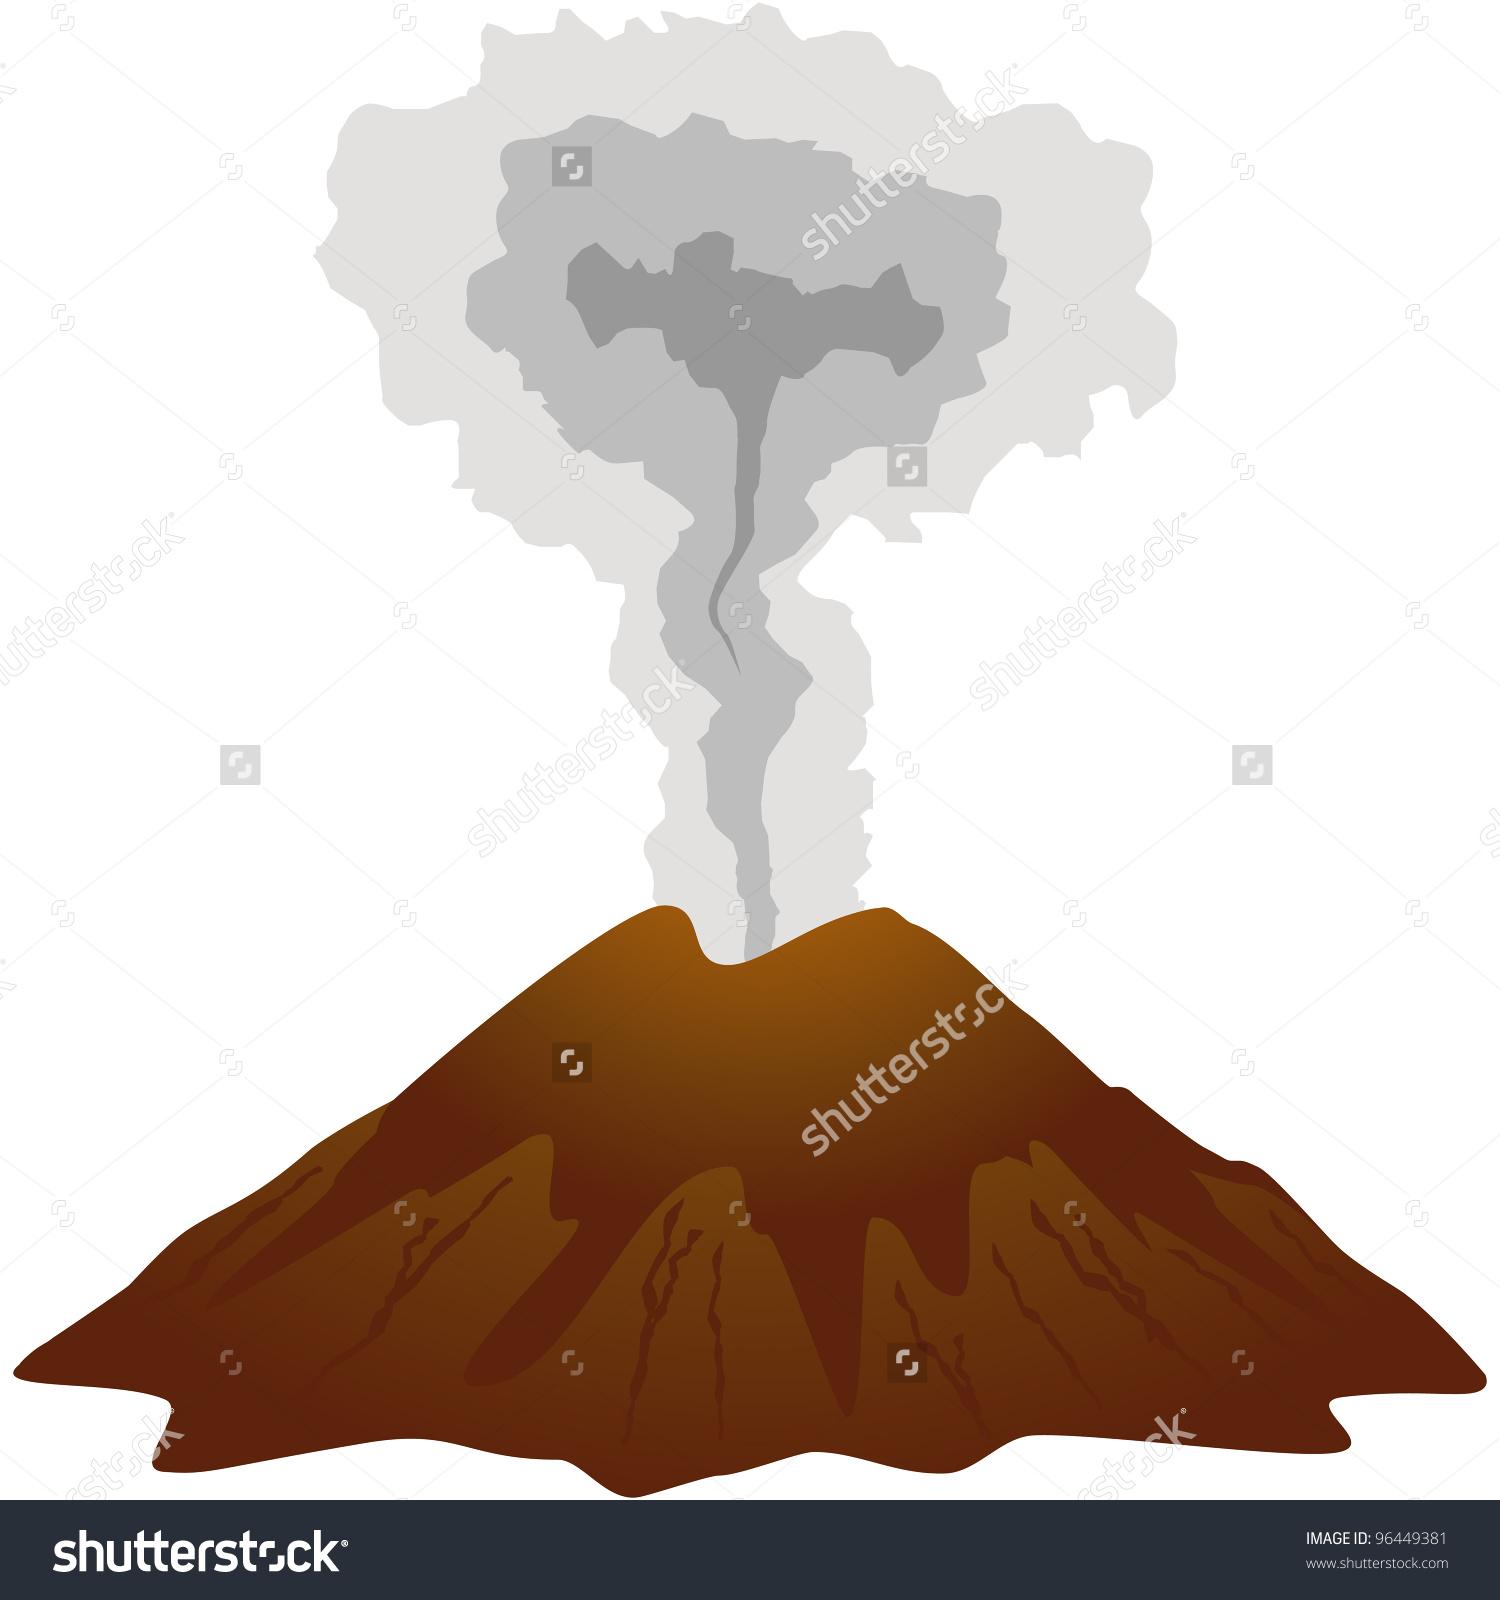 Dormant Volcano Icon Isolated On White Stock Vector 96449381.